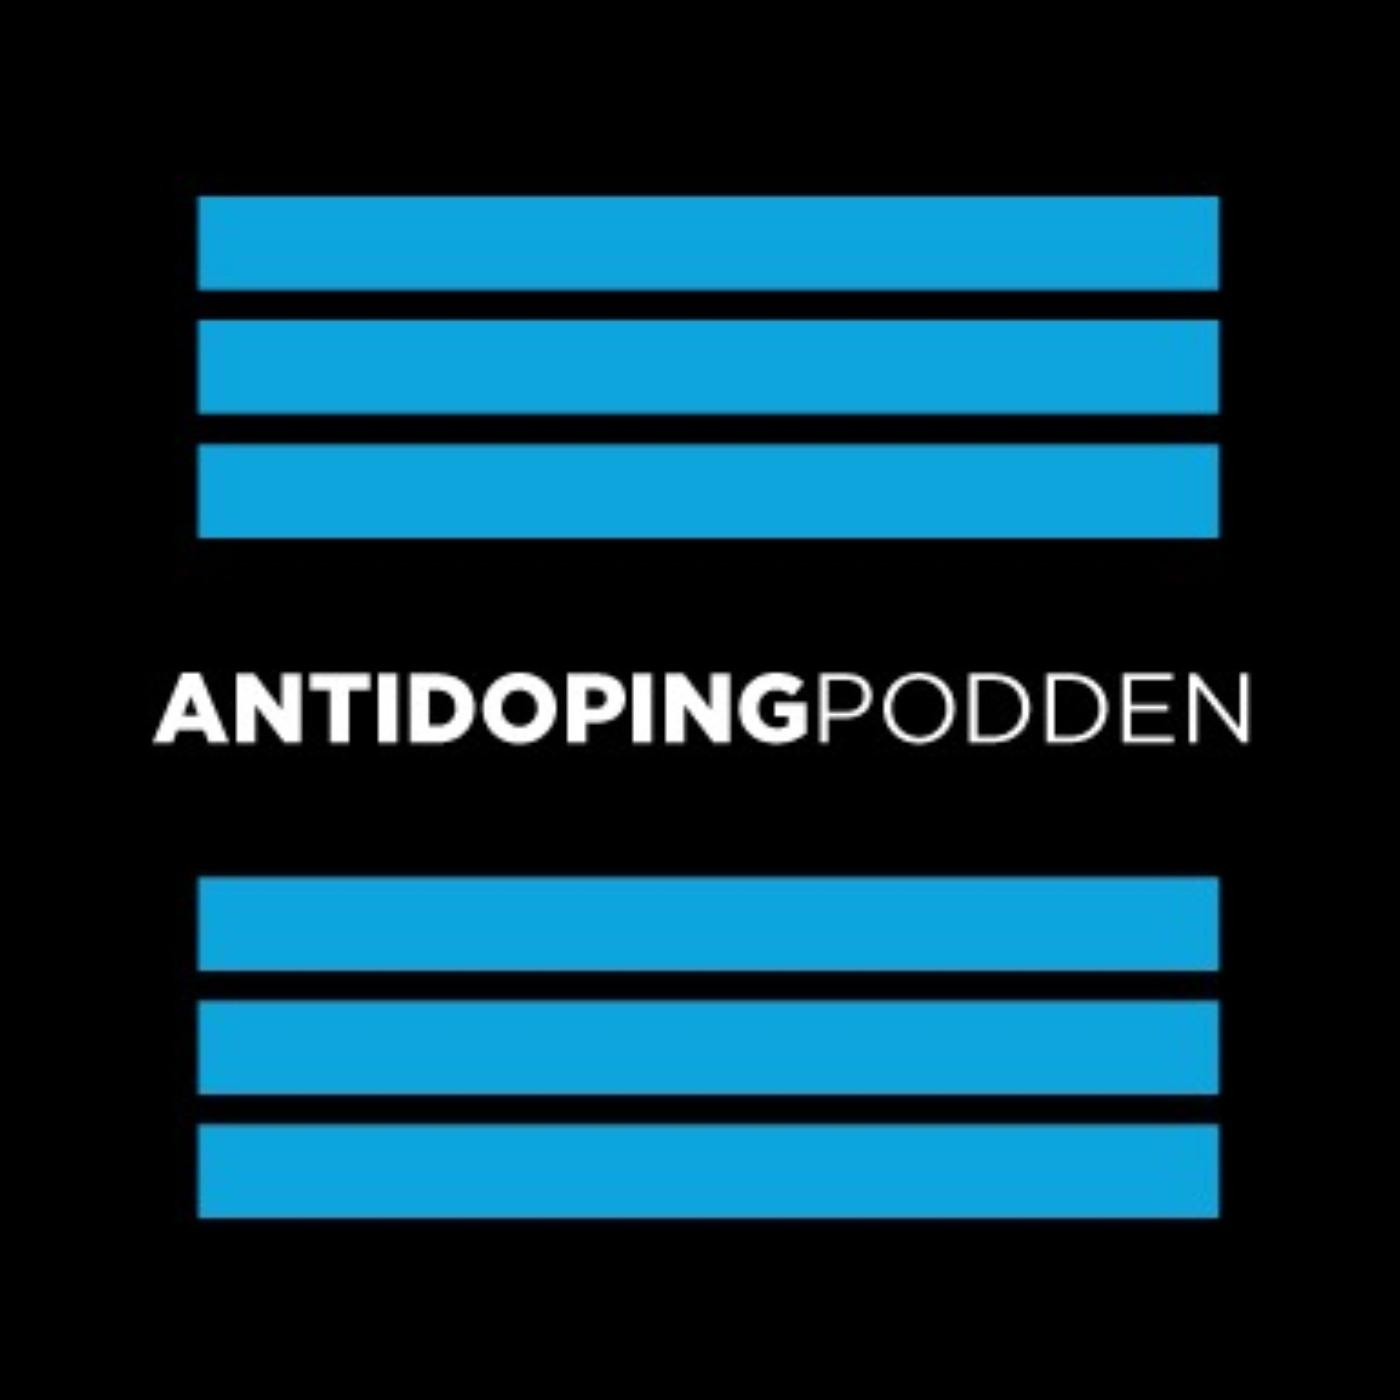 Antidoping-podden